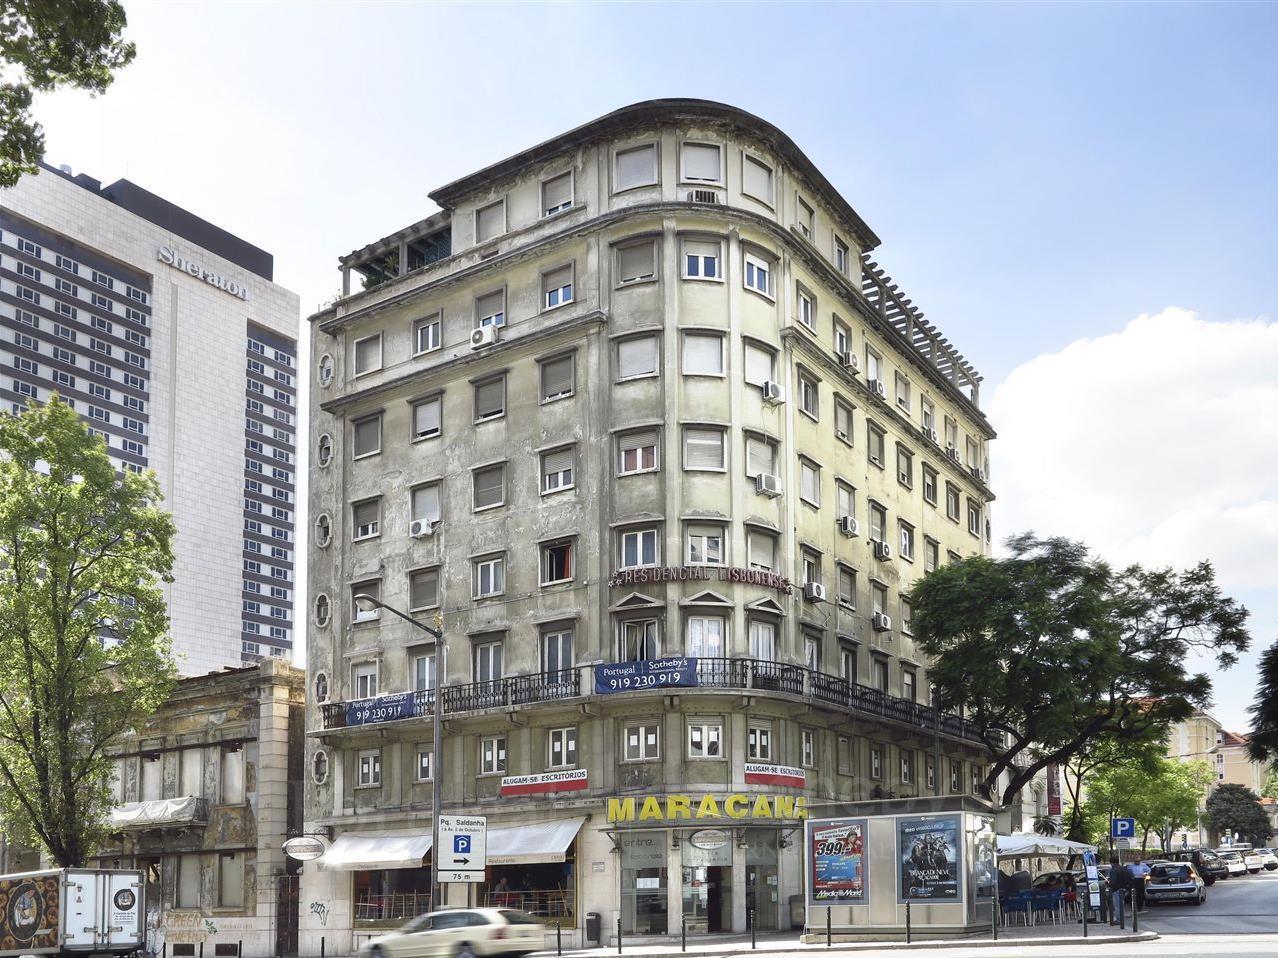 Casa multifamiliare per Vendita alle ore Building for Sale Saldanha, Lisboa, Lisbona Portogallo